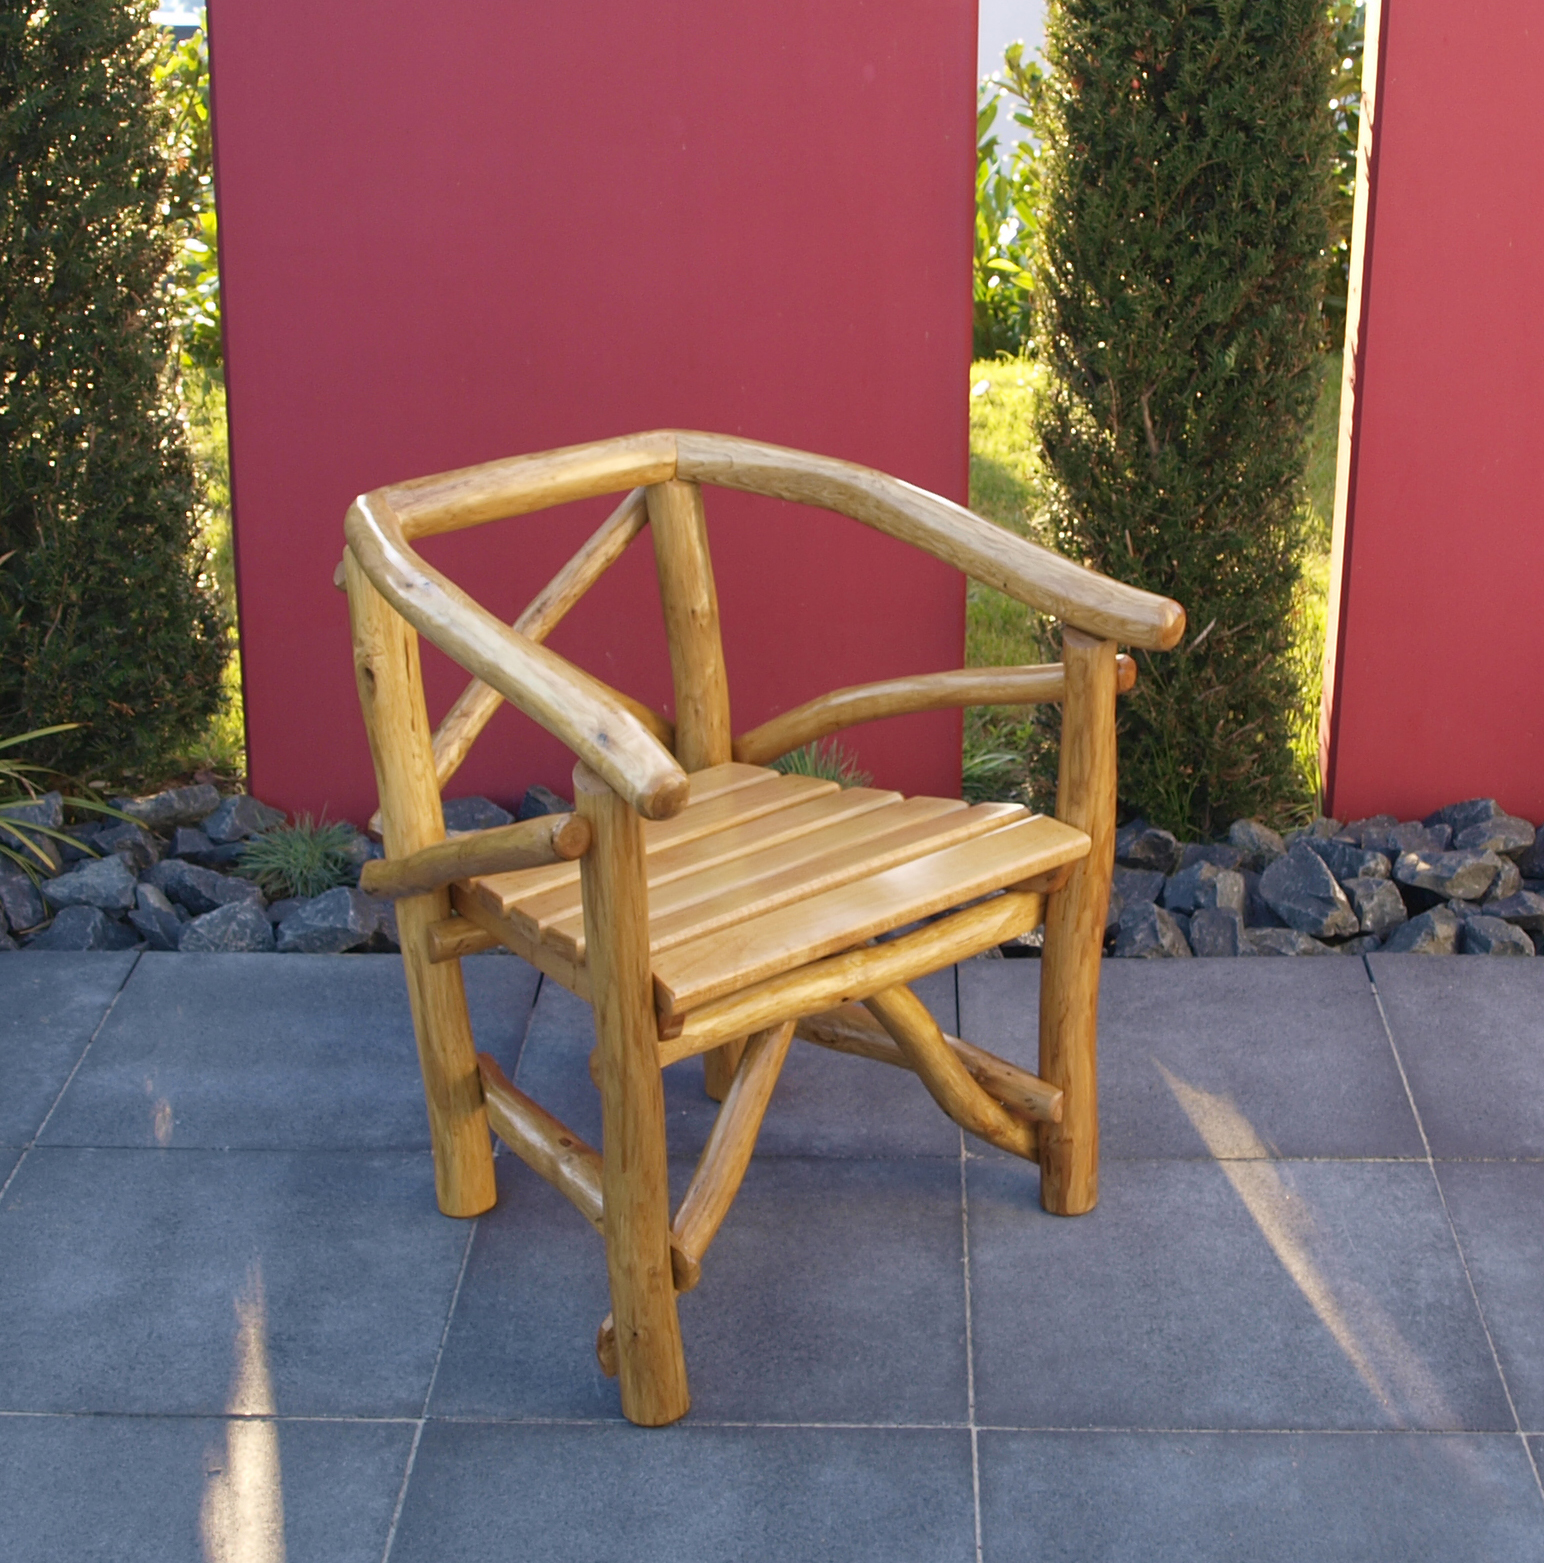 Pfeiffer Knüppelholz Sessel Holzsessel Knüppelholzsessel ROSSBACHTAL